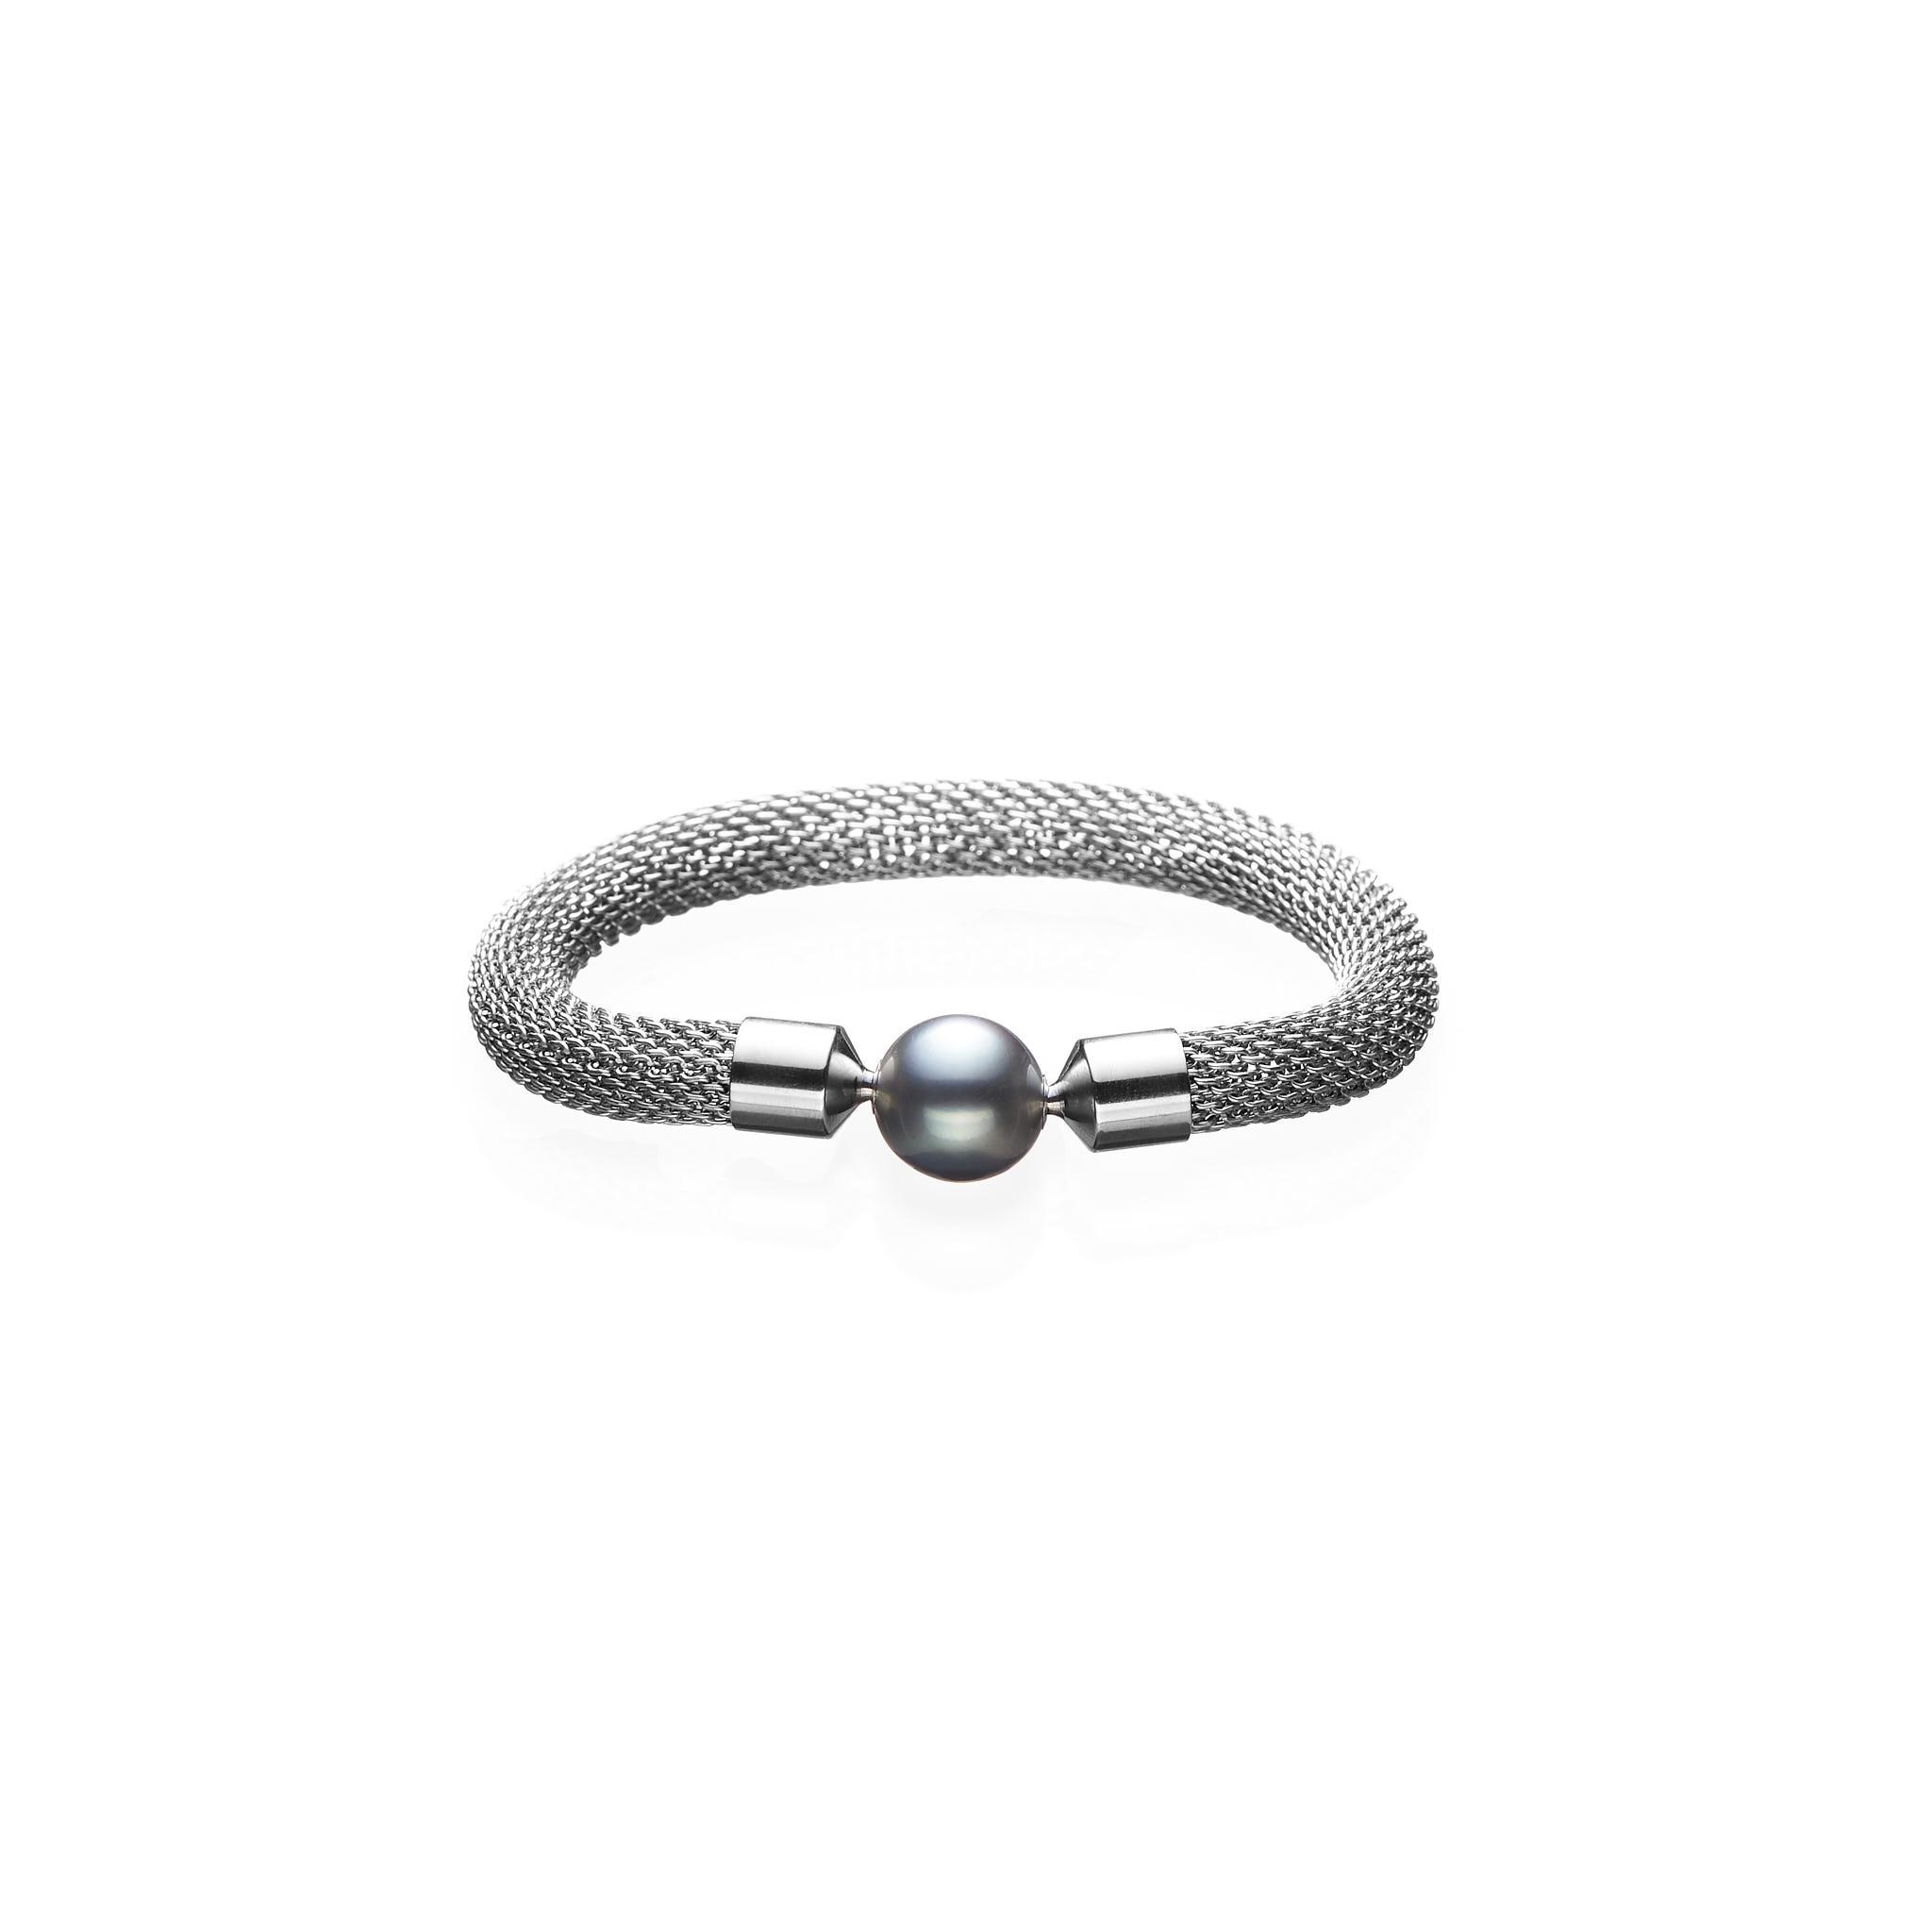 Anuanua Bracelet - Stainless Steel.jpg